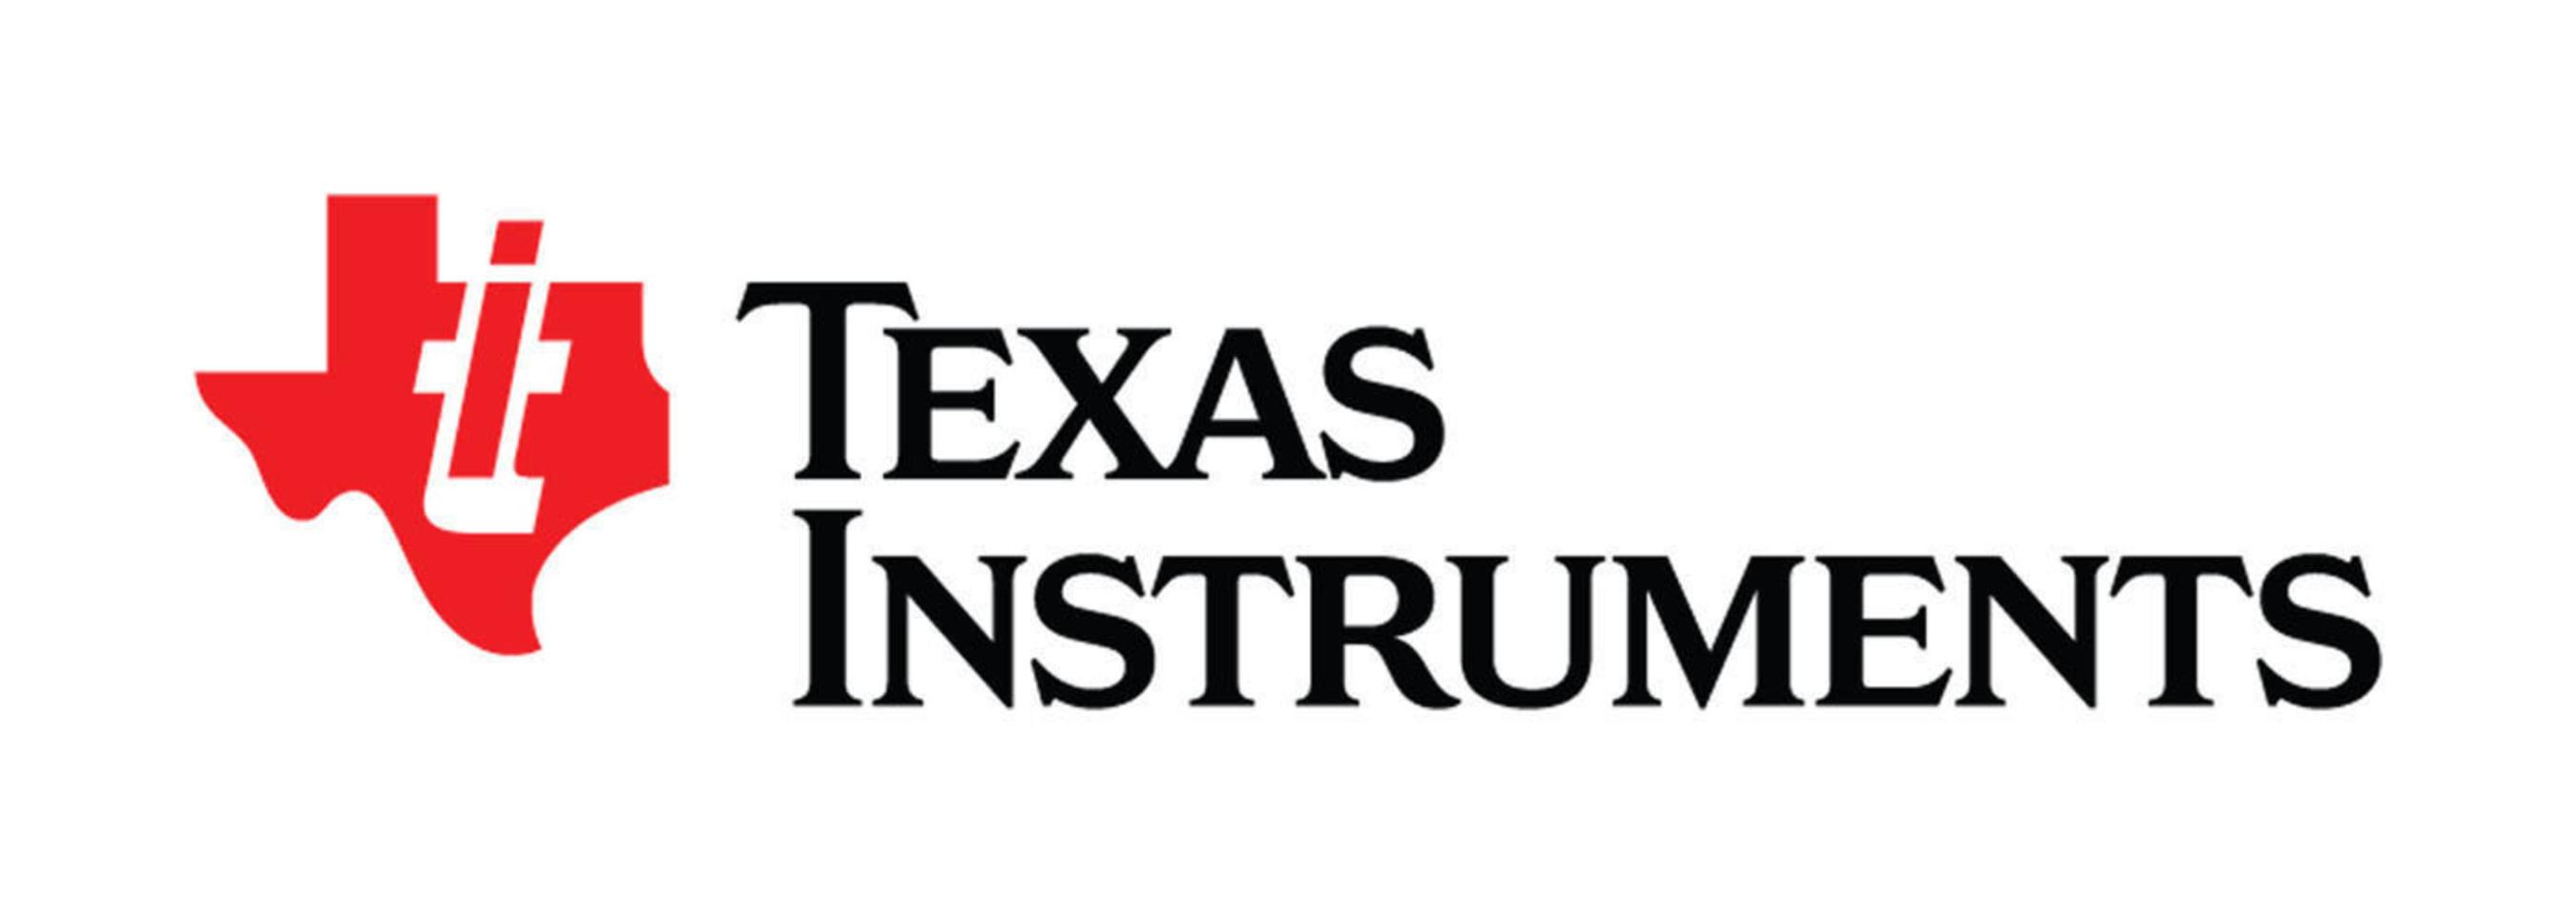 Texas Instruments Logo.